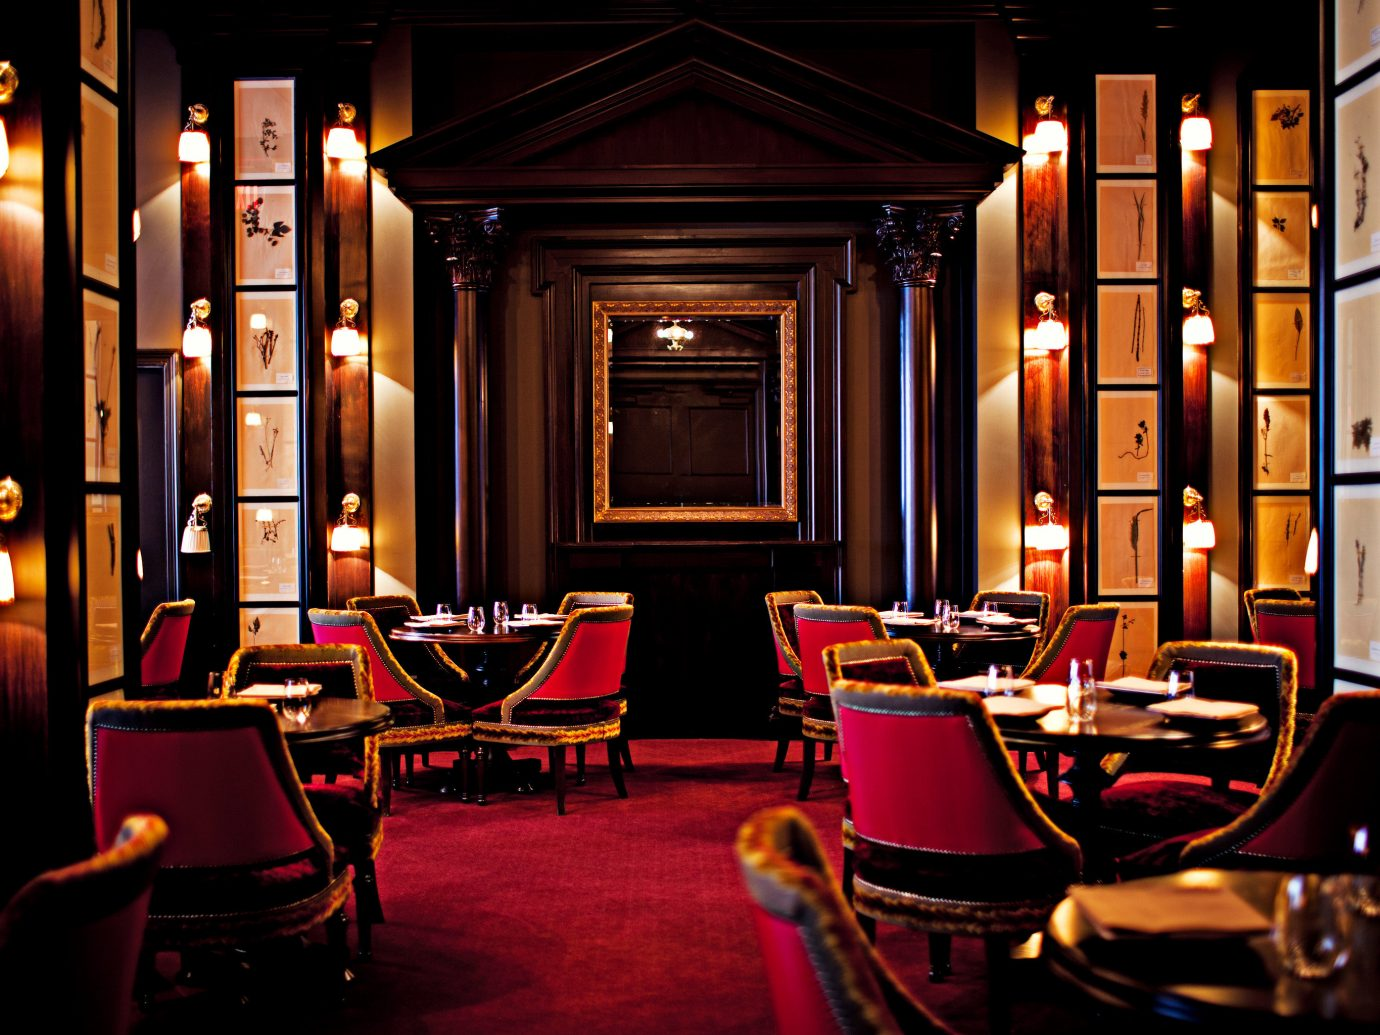 The NoMad Hotel Bar City Dining Drink Eat Hip Hotels Luxury Nightlife NYC indoor floor room restaurant ceiling lighting interior design lit living room night furniture